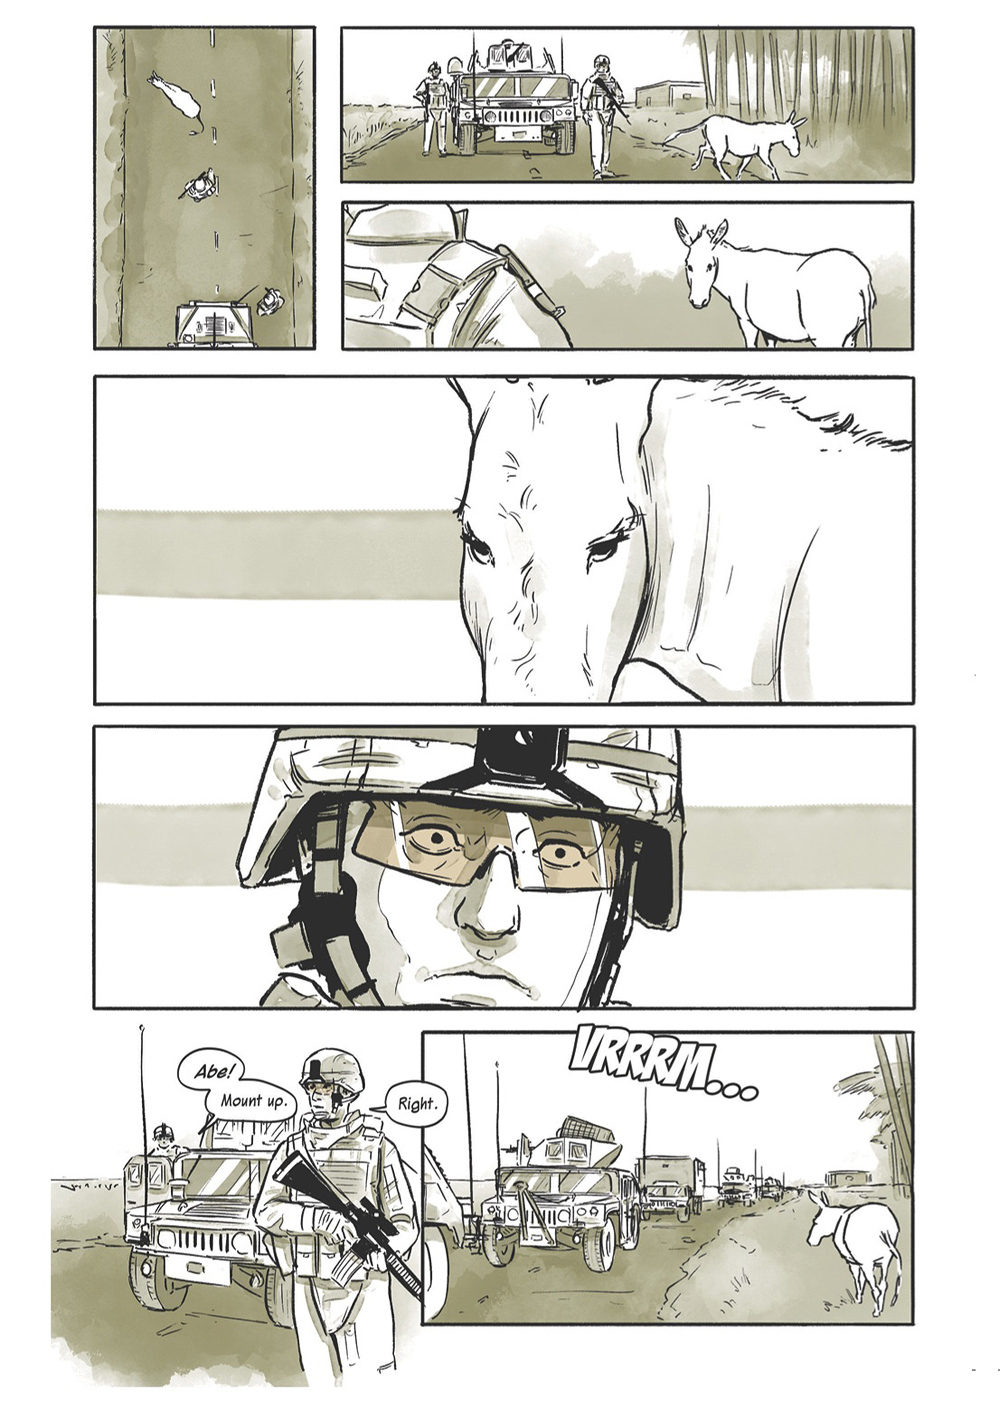 White Donkey_LitHub excerpt 5